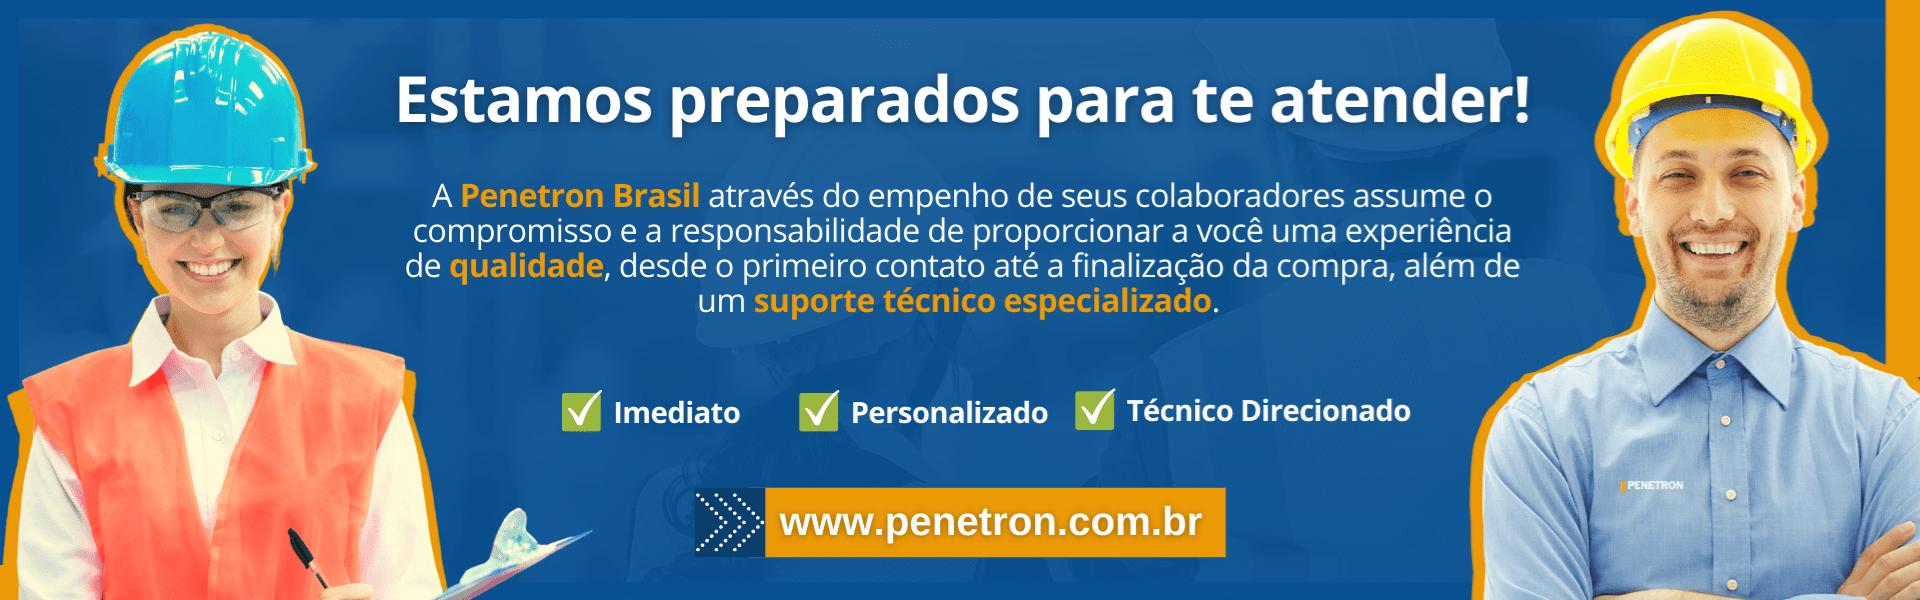 Atendimento Penetron Brasil